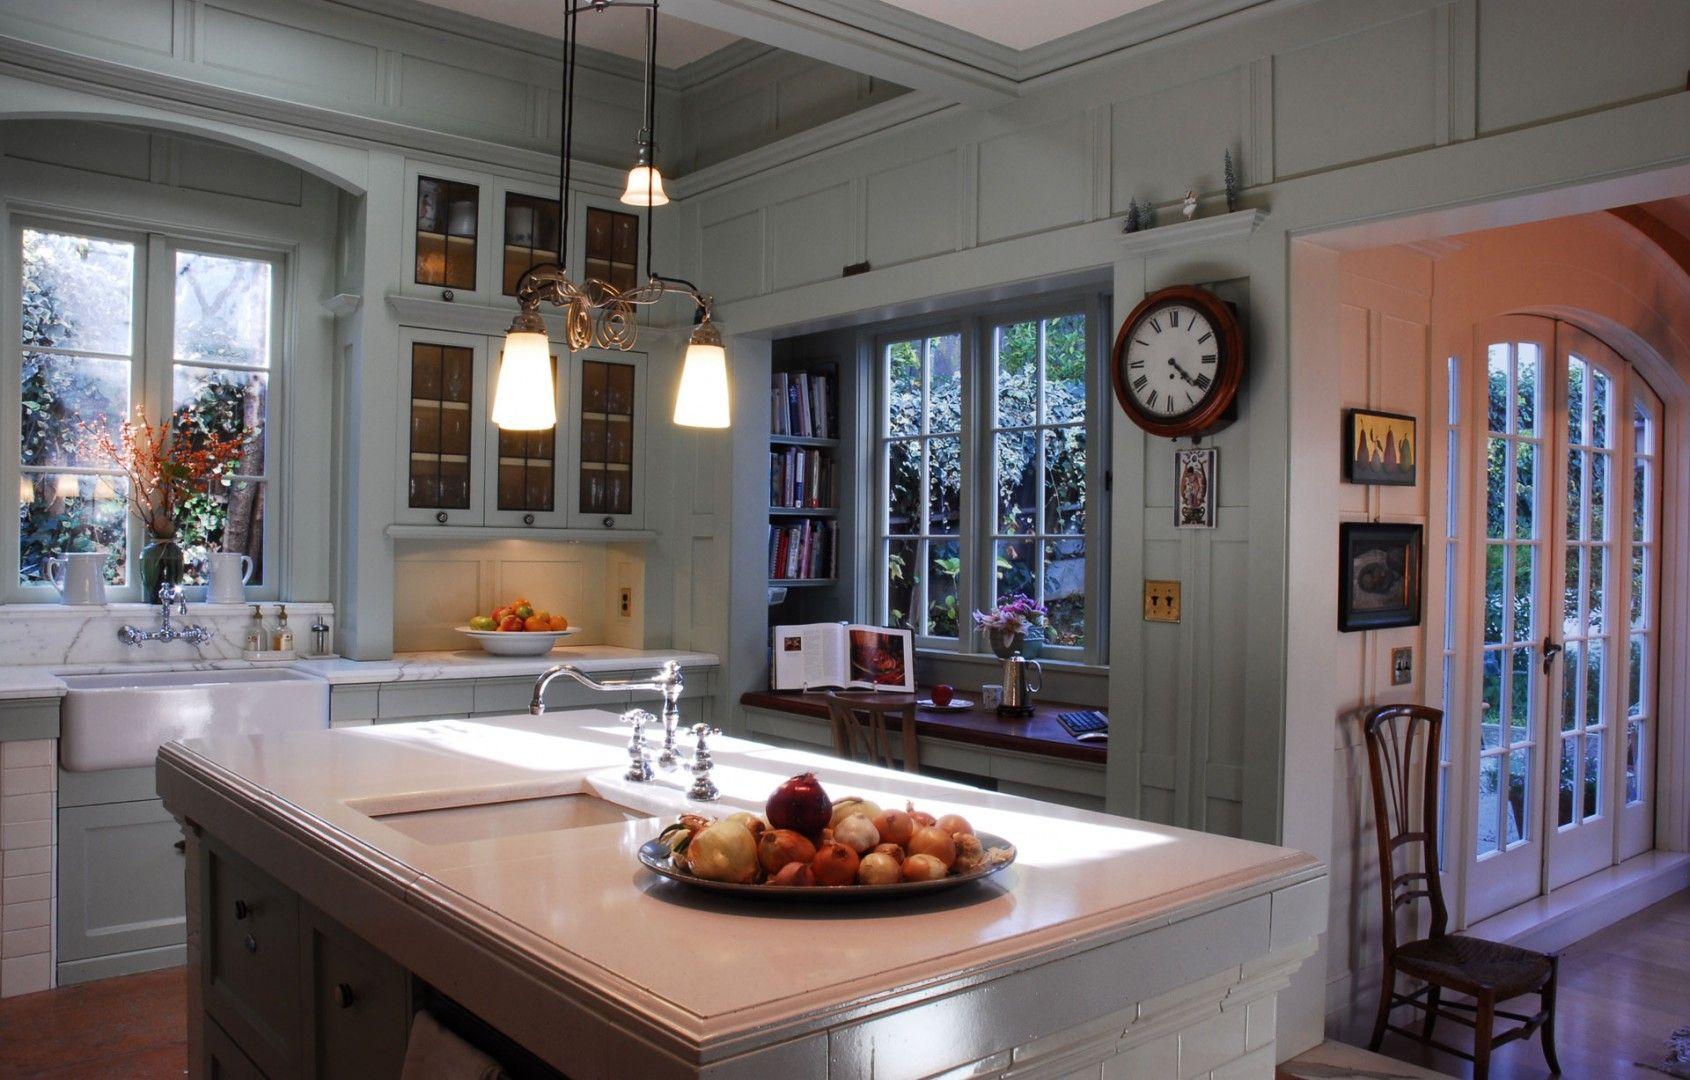 Spaces | John Malick & Associates I like the cookbook bookshelf at the window desk.  Good area for baking as well.